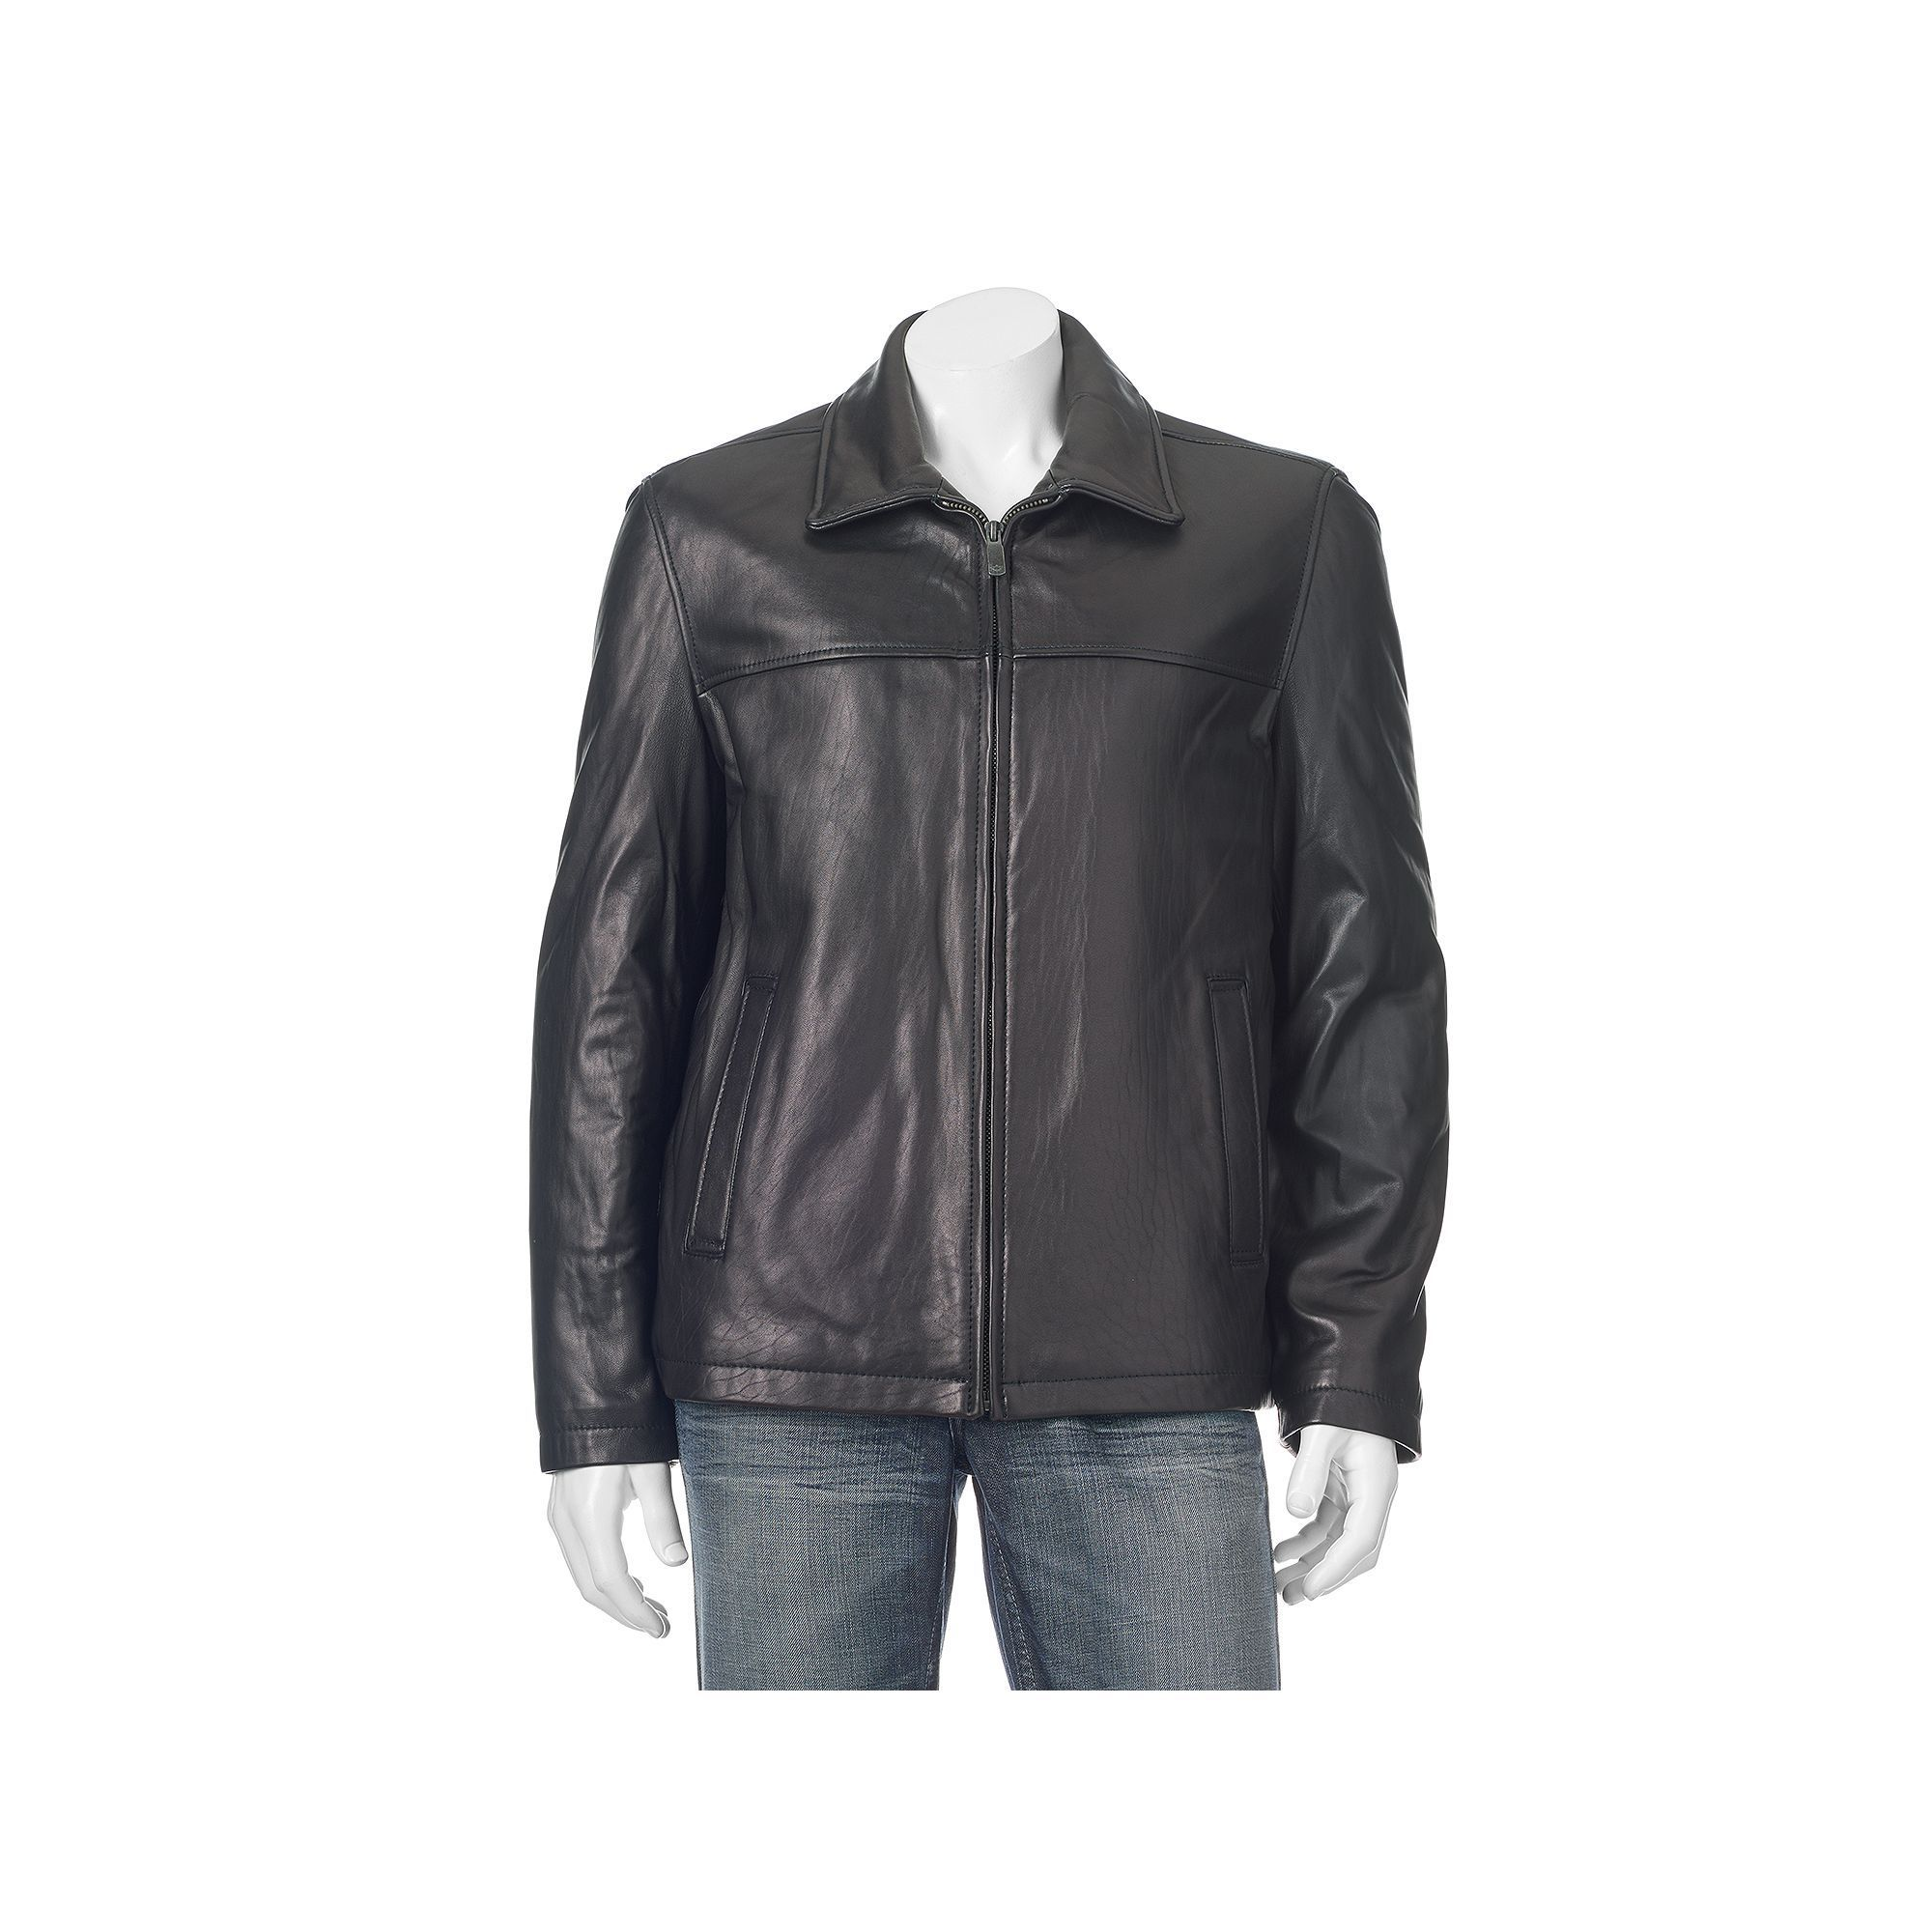 Men's Dockers Leather Shell OpenBottom Jacket Jackets